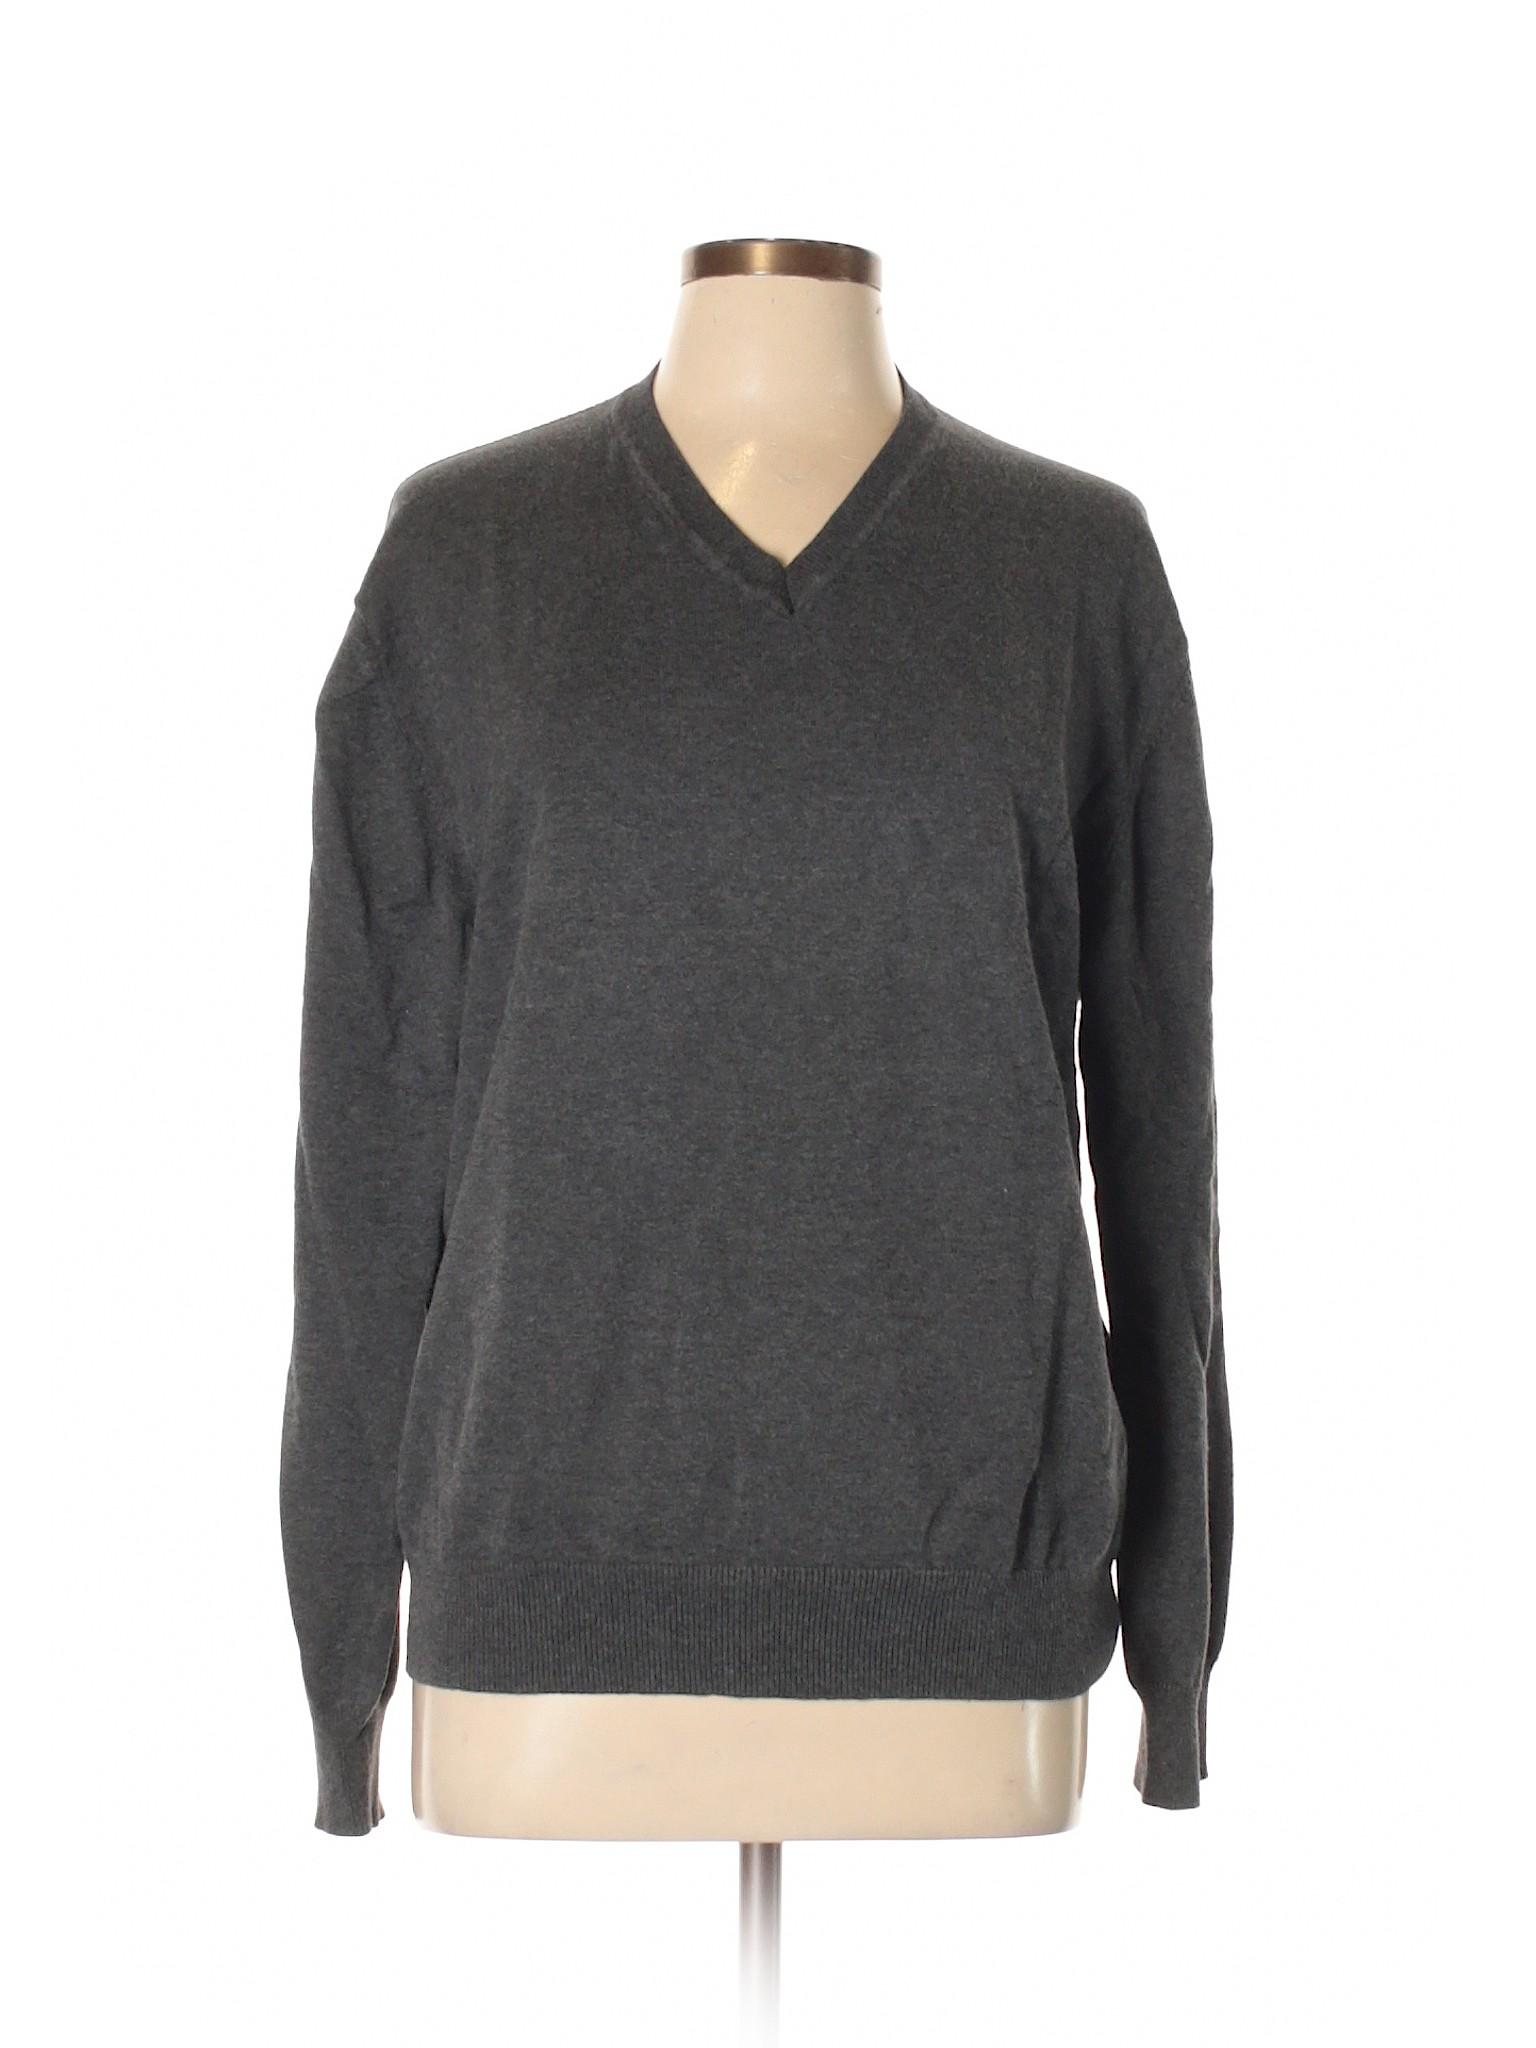 Boutique Gap Pullover winter winter Gap Sweater Boutique Pullover 8T5wwZq